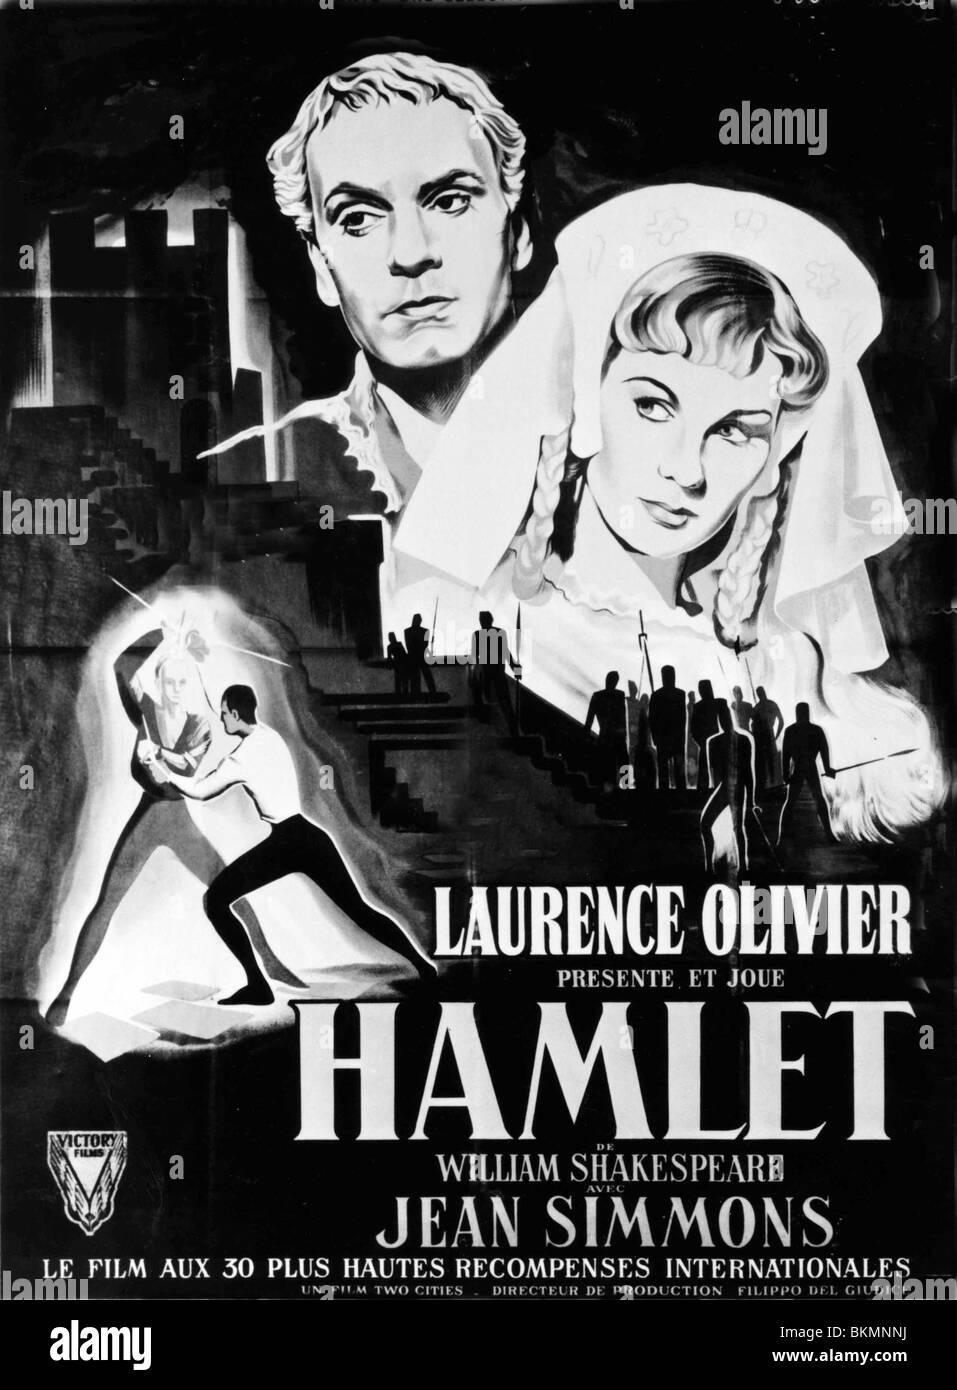 HAMLET (1948) POSTER LAURENCE OLIVIER (DIR) HMLT 012P ...